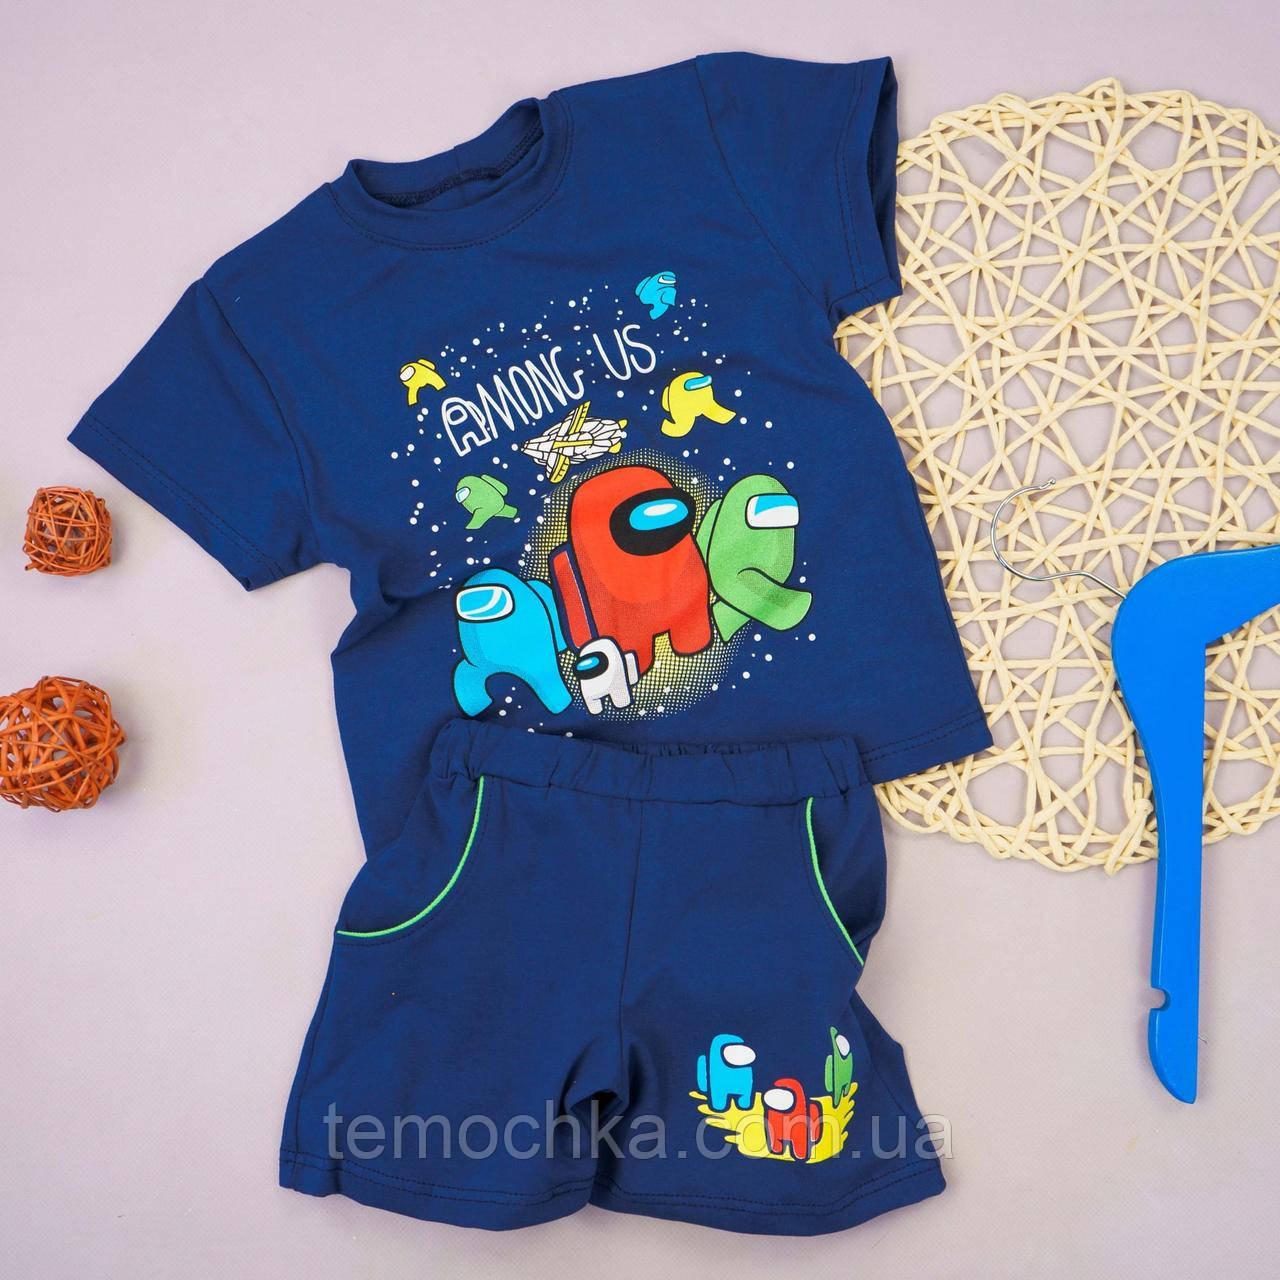 Комплект футболка і шорти для хлопчика Амонг Ас